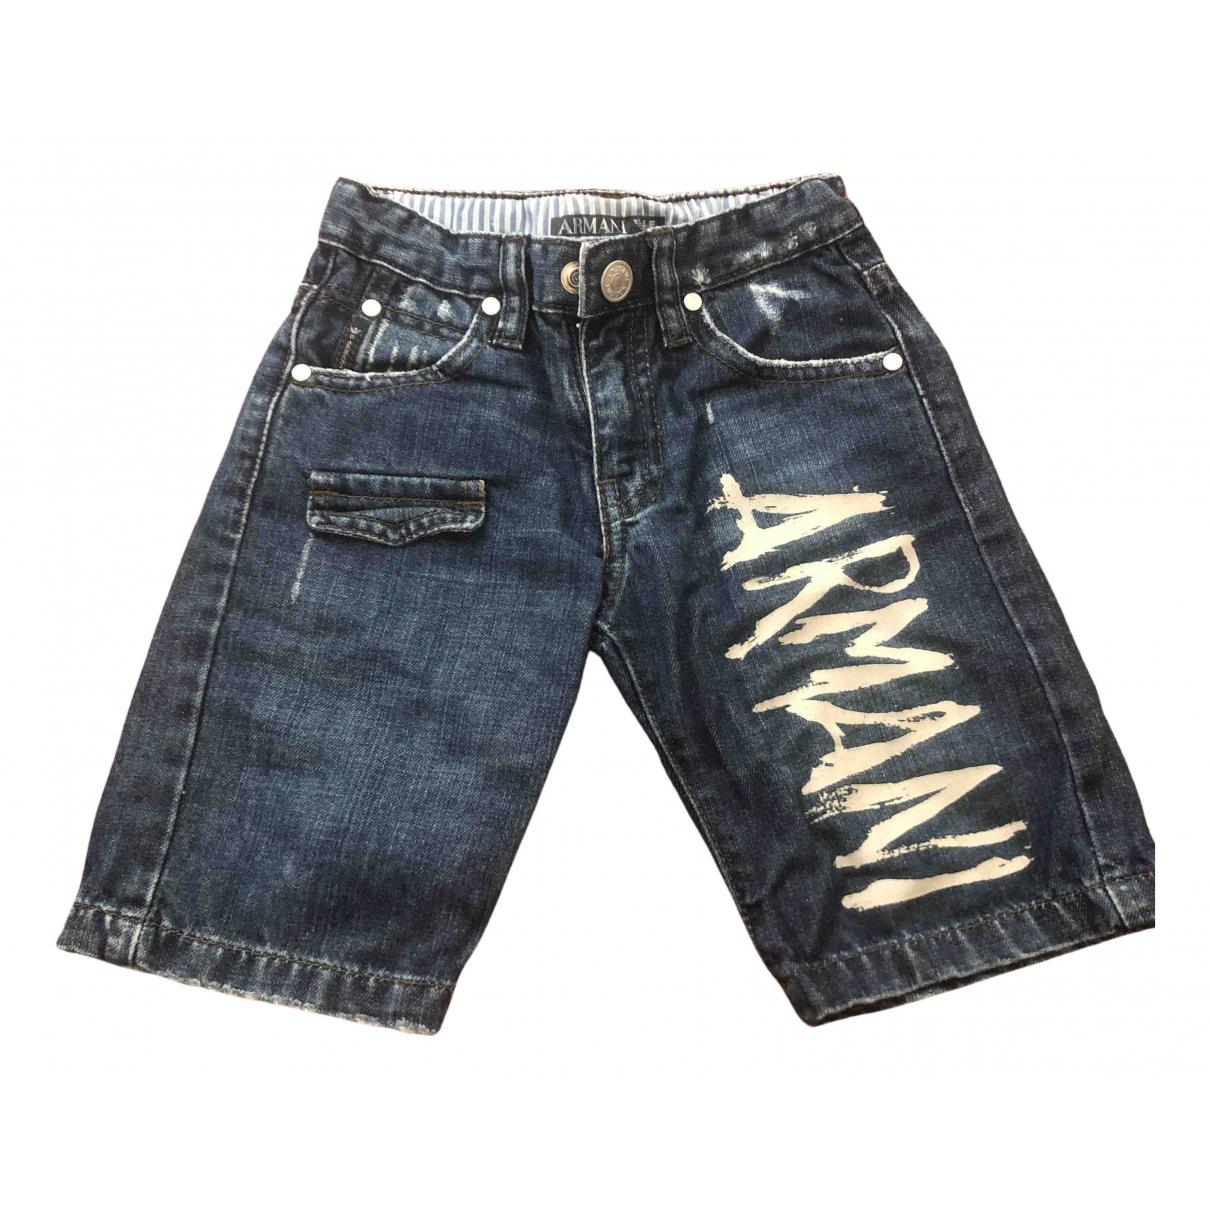 en Denim - Vaquero Azul Armani Jeans